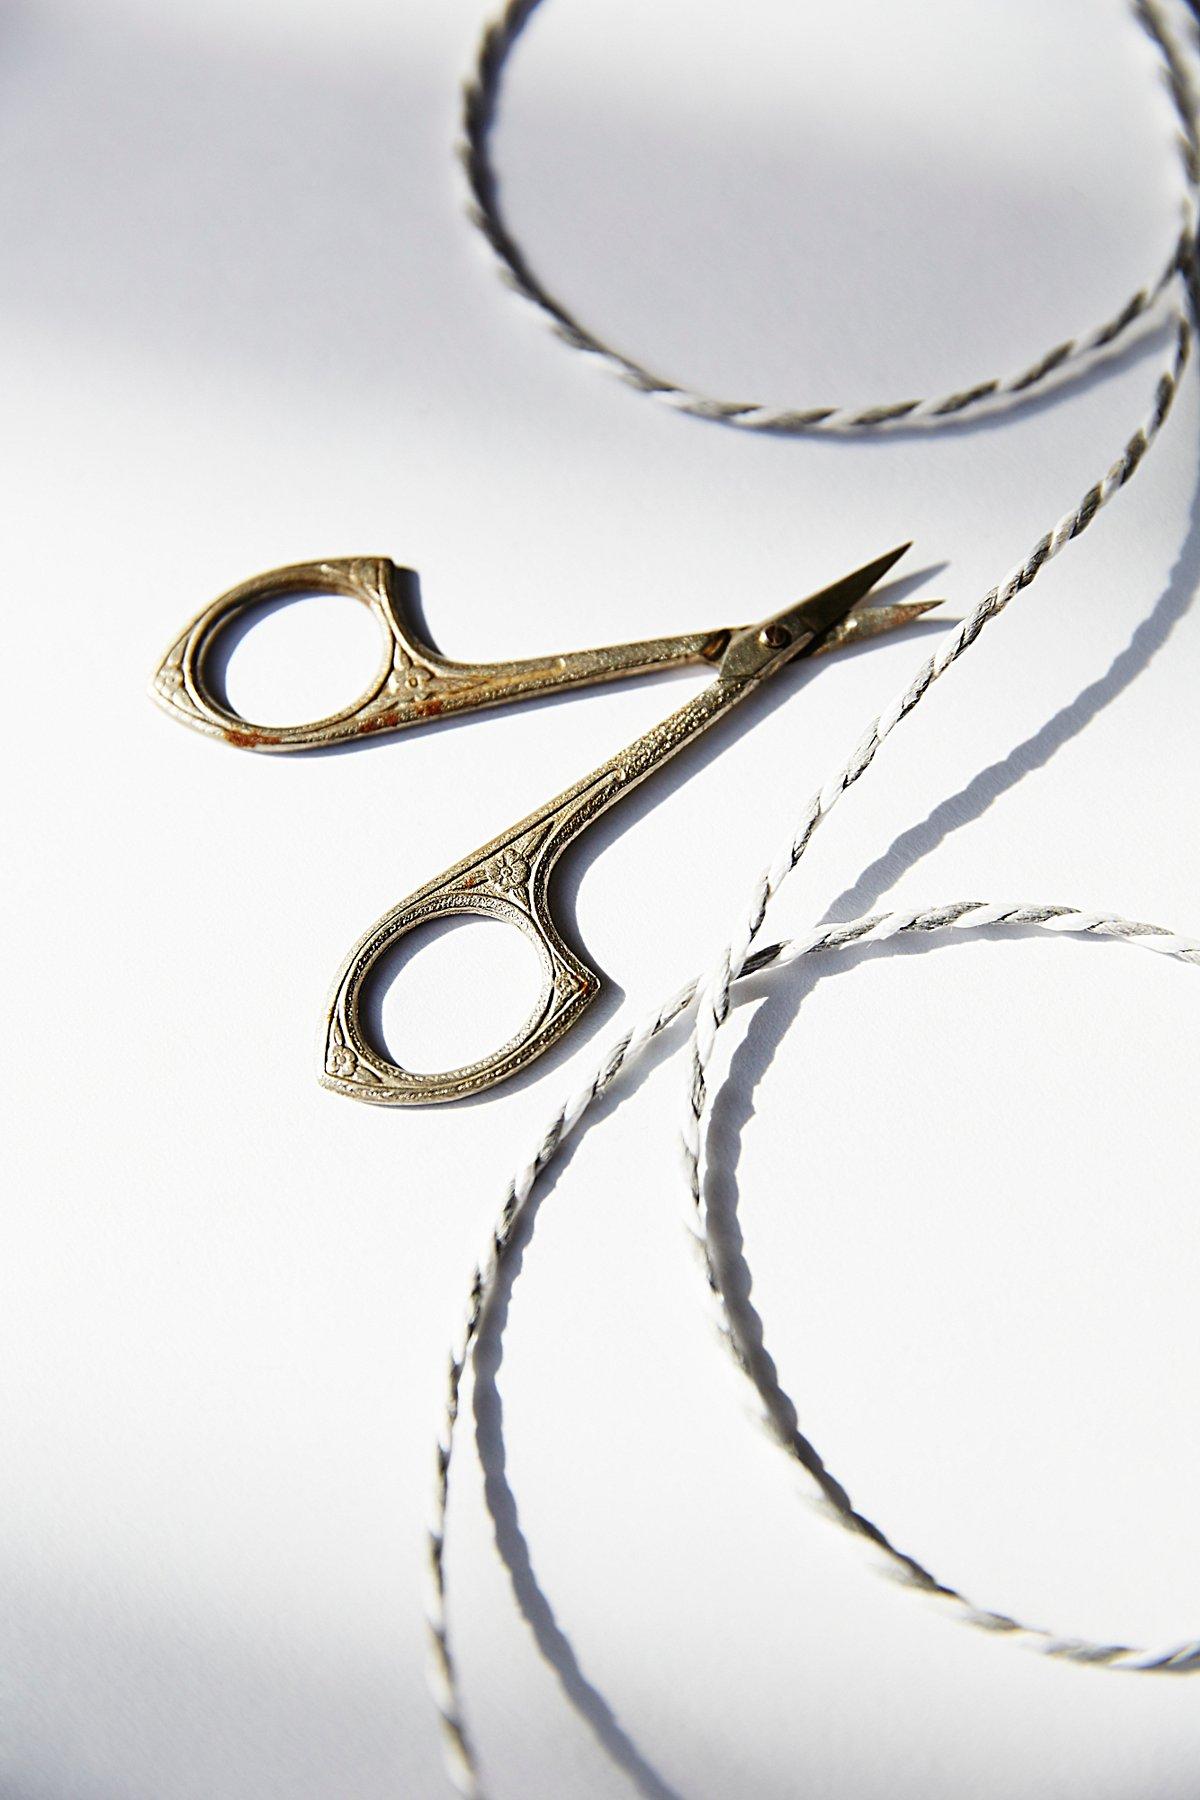 Vintage 1940s Sewing Scissors